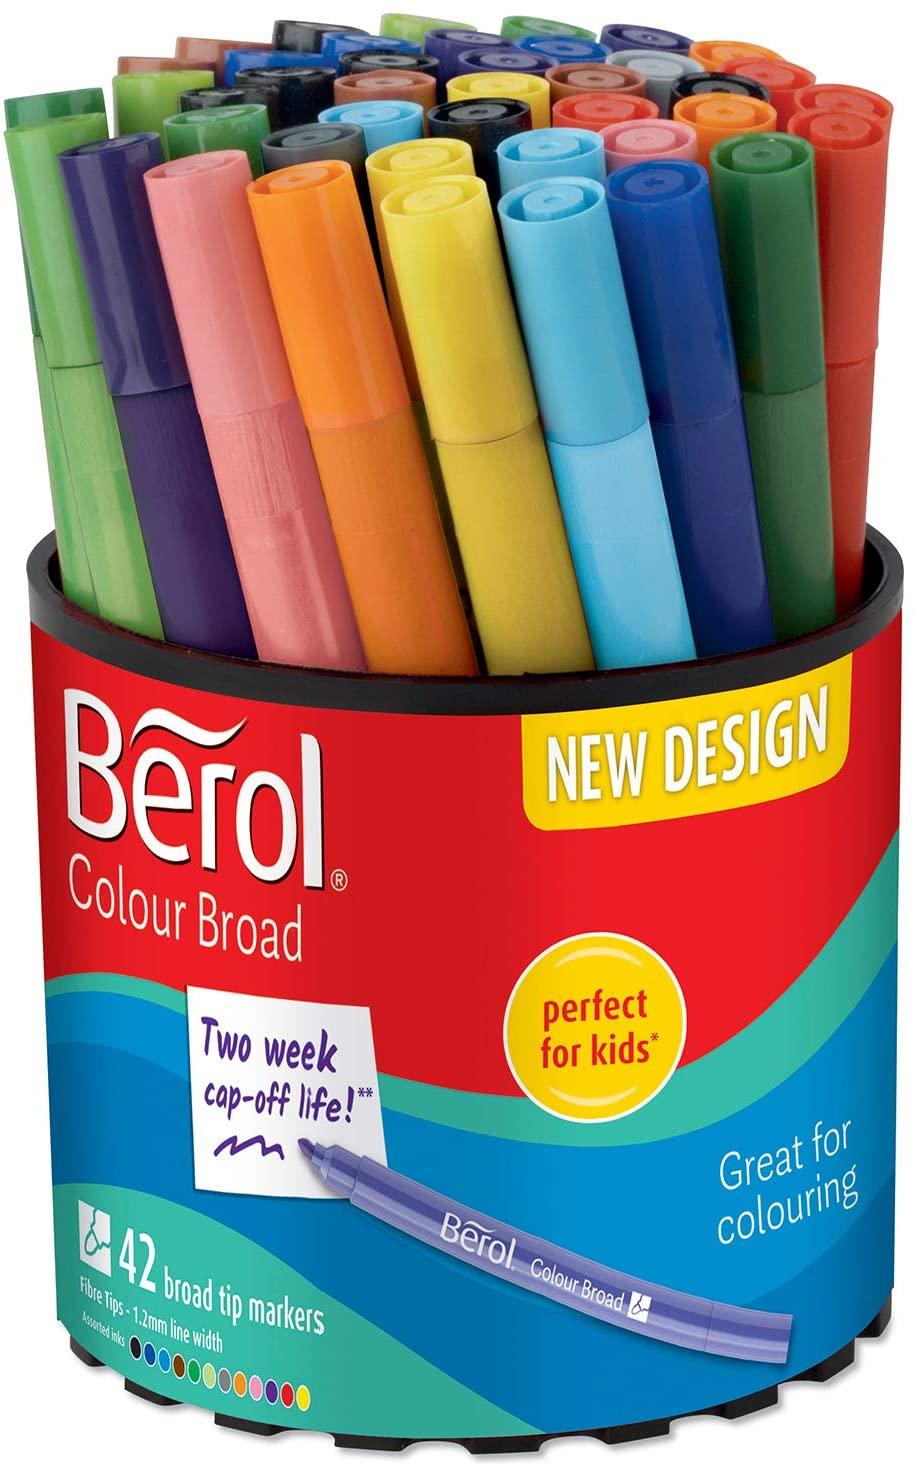 42 Berol Felt Tip Colouring Pens, Broad Point £10.46 at Amazon Prime / £14.95 Non Prime